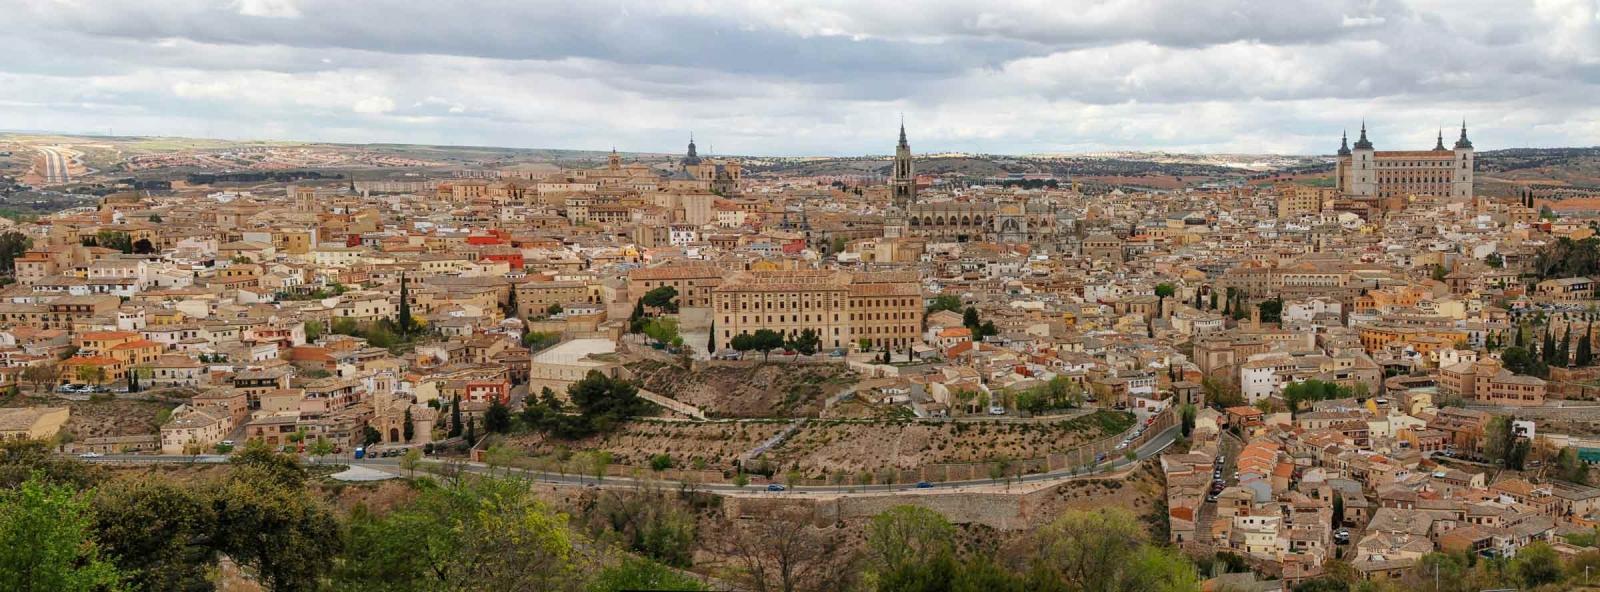 ToledoPanorama1website.jpg